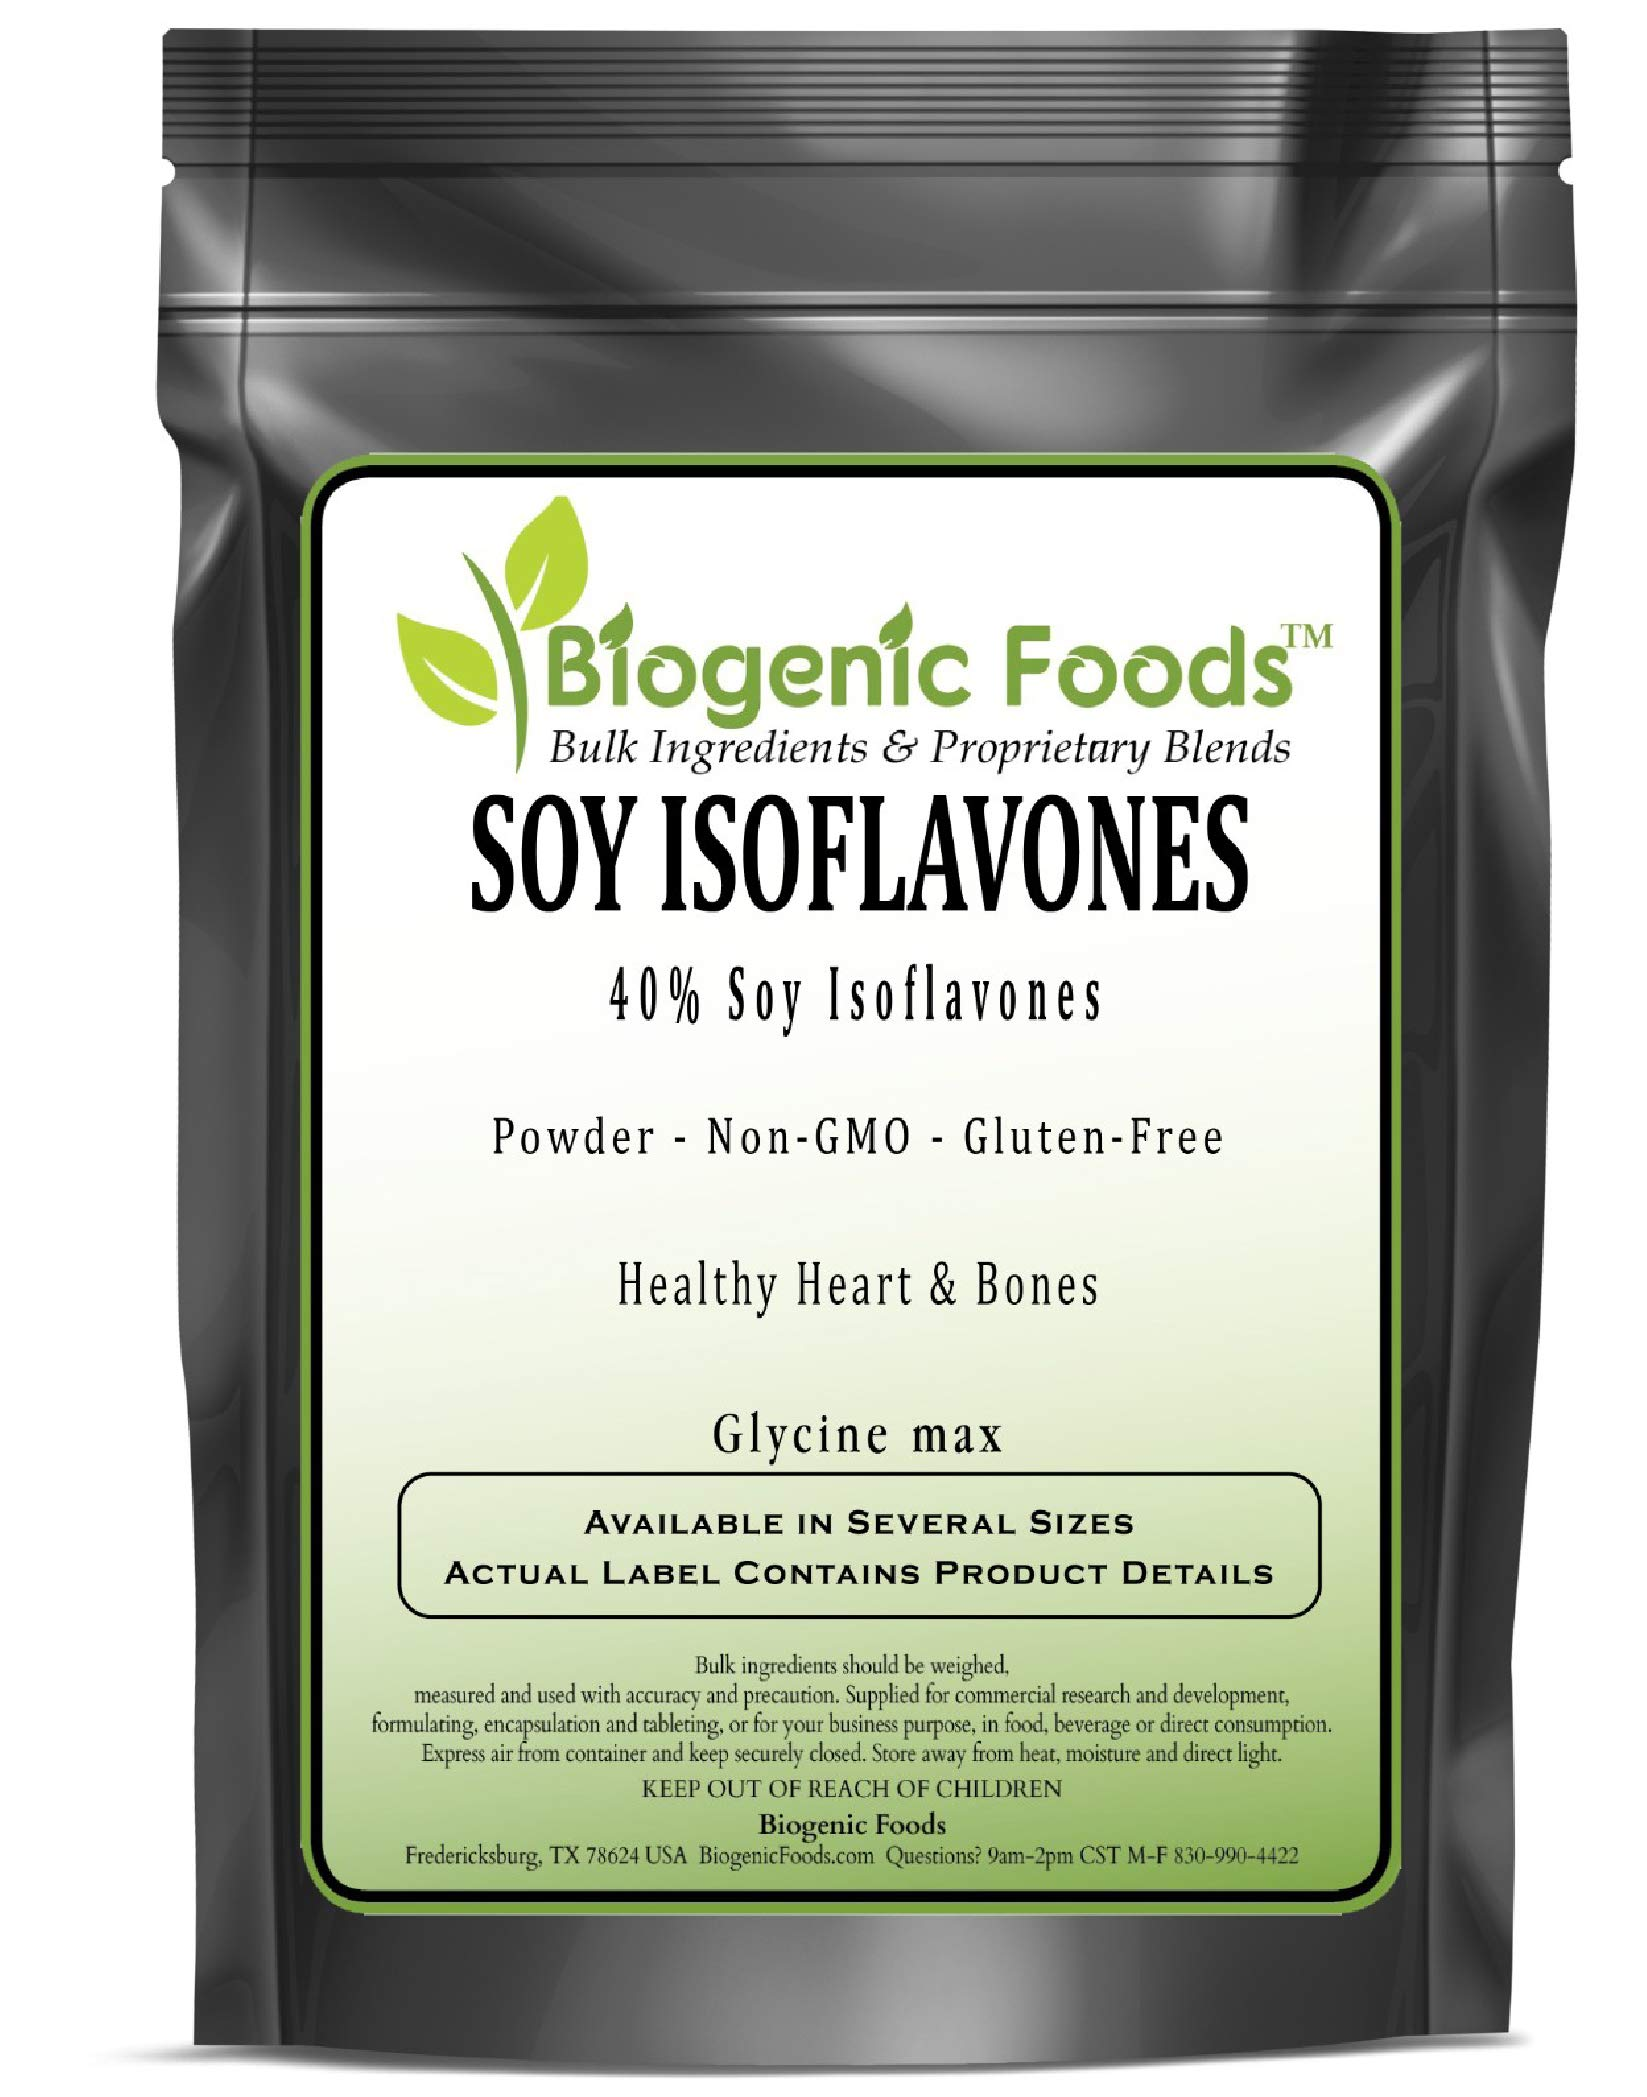 Soy Isoflavones - 40% Soy Isoflavones Powder Extract (Glycine max), 1 kg